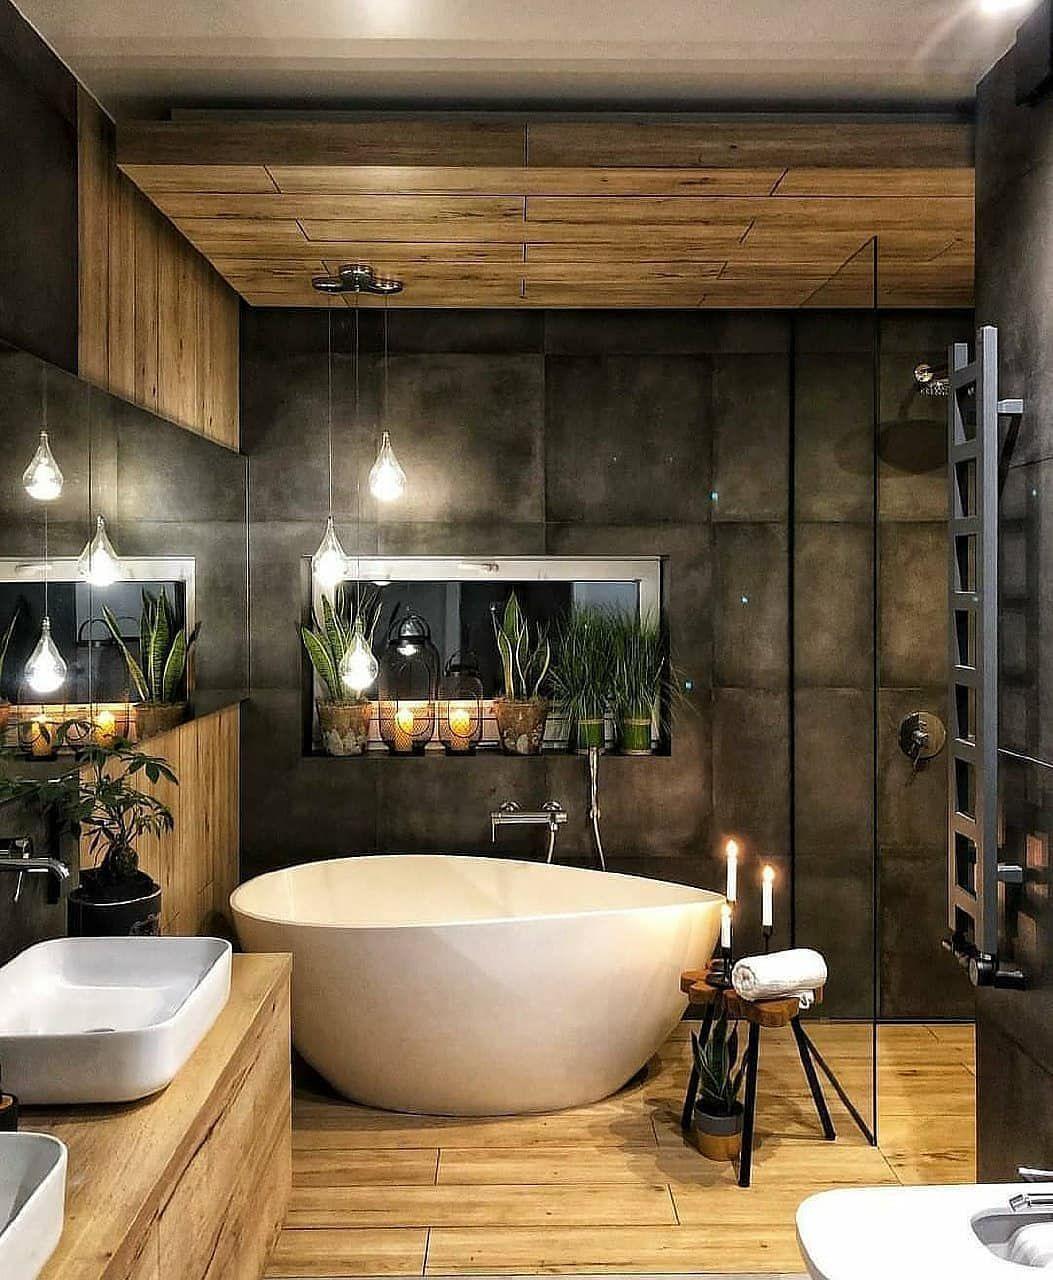 17++ Deco salle de bain idee ideas in 2021